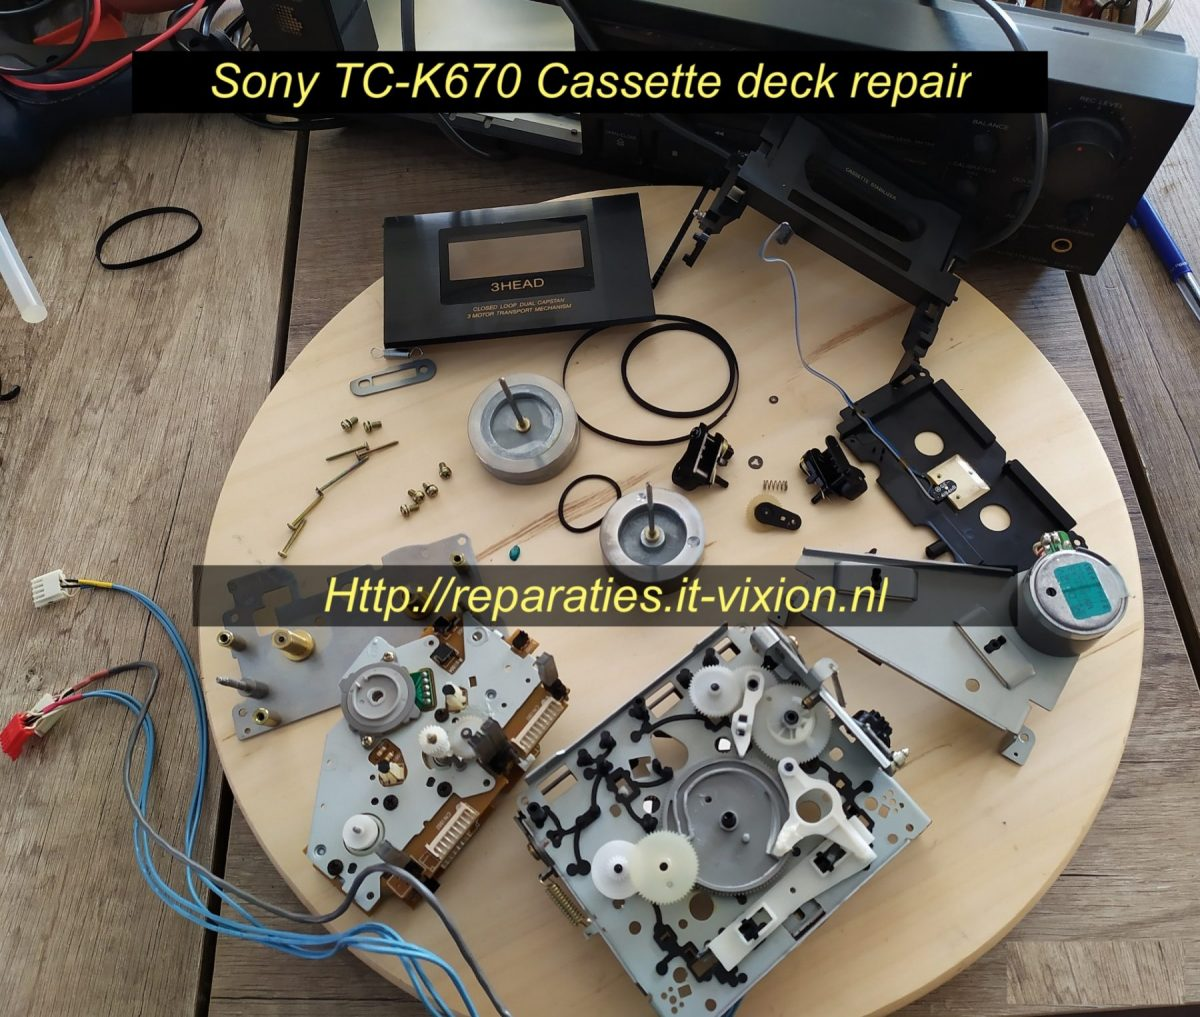 sony tc-k670 cassette deck repair